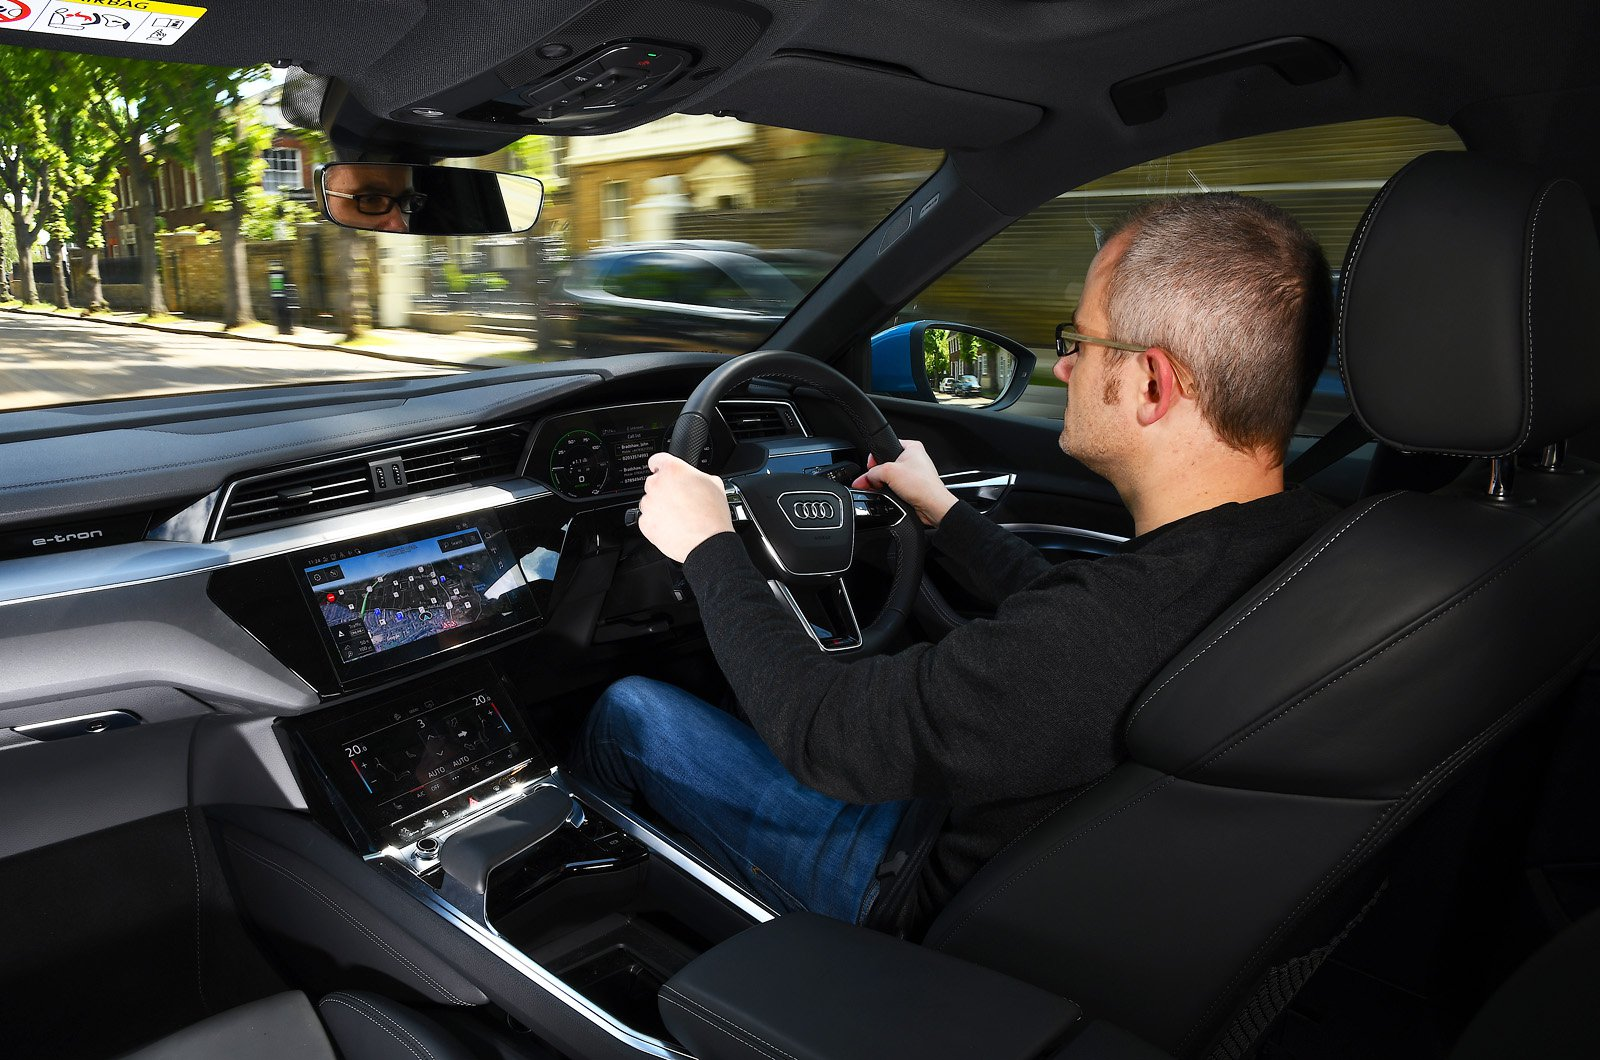 LT Audi E-tron Sportback - behind the wheel